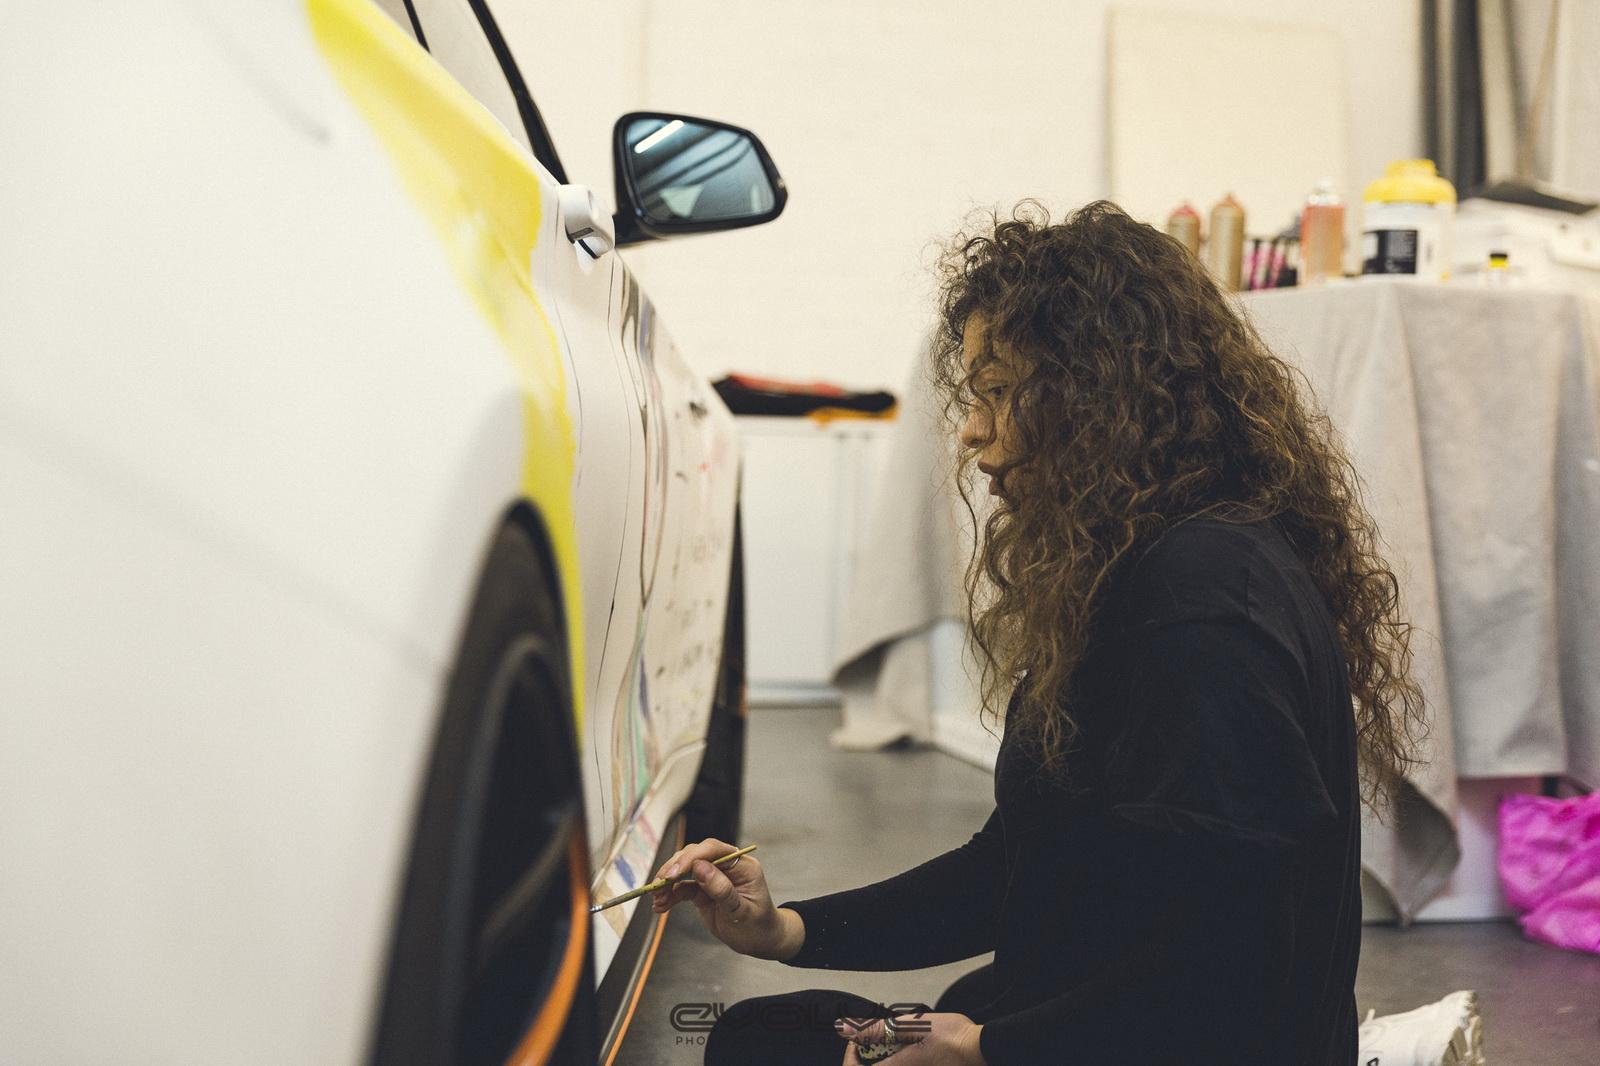 evolve-automotive-bmw-m2-gts-art-car-17